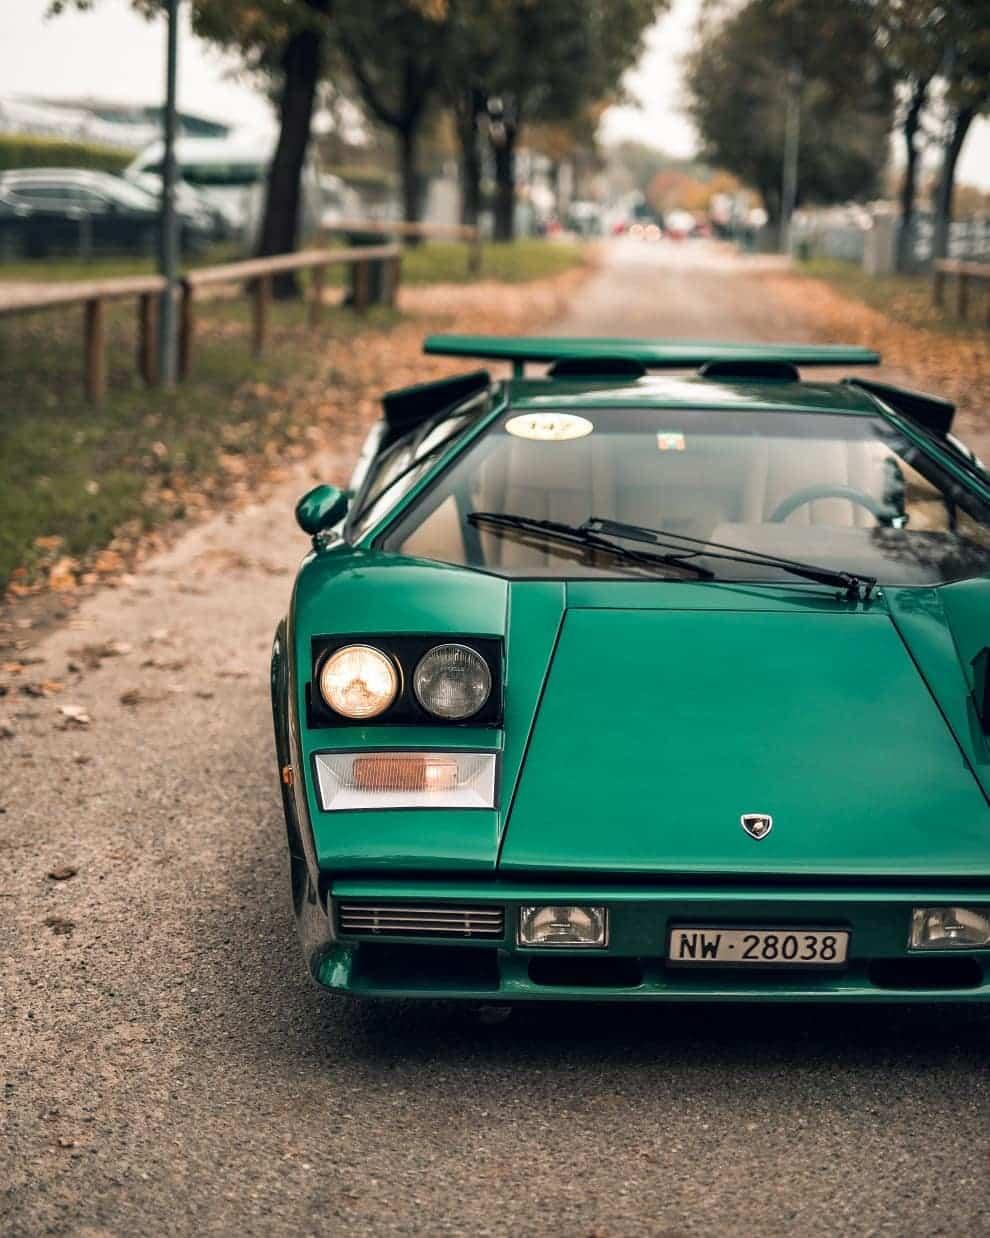 Lamborghini Countach @davidclementephotography - Image 7